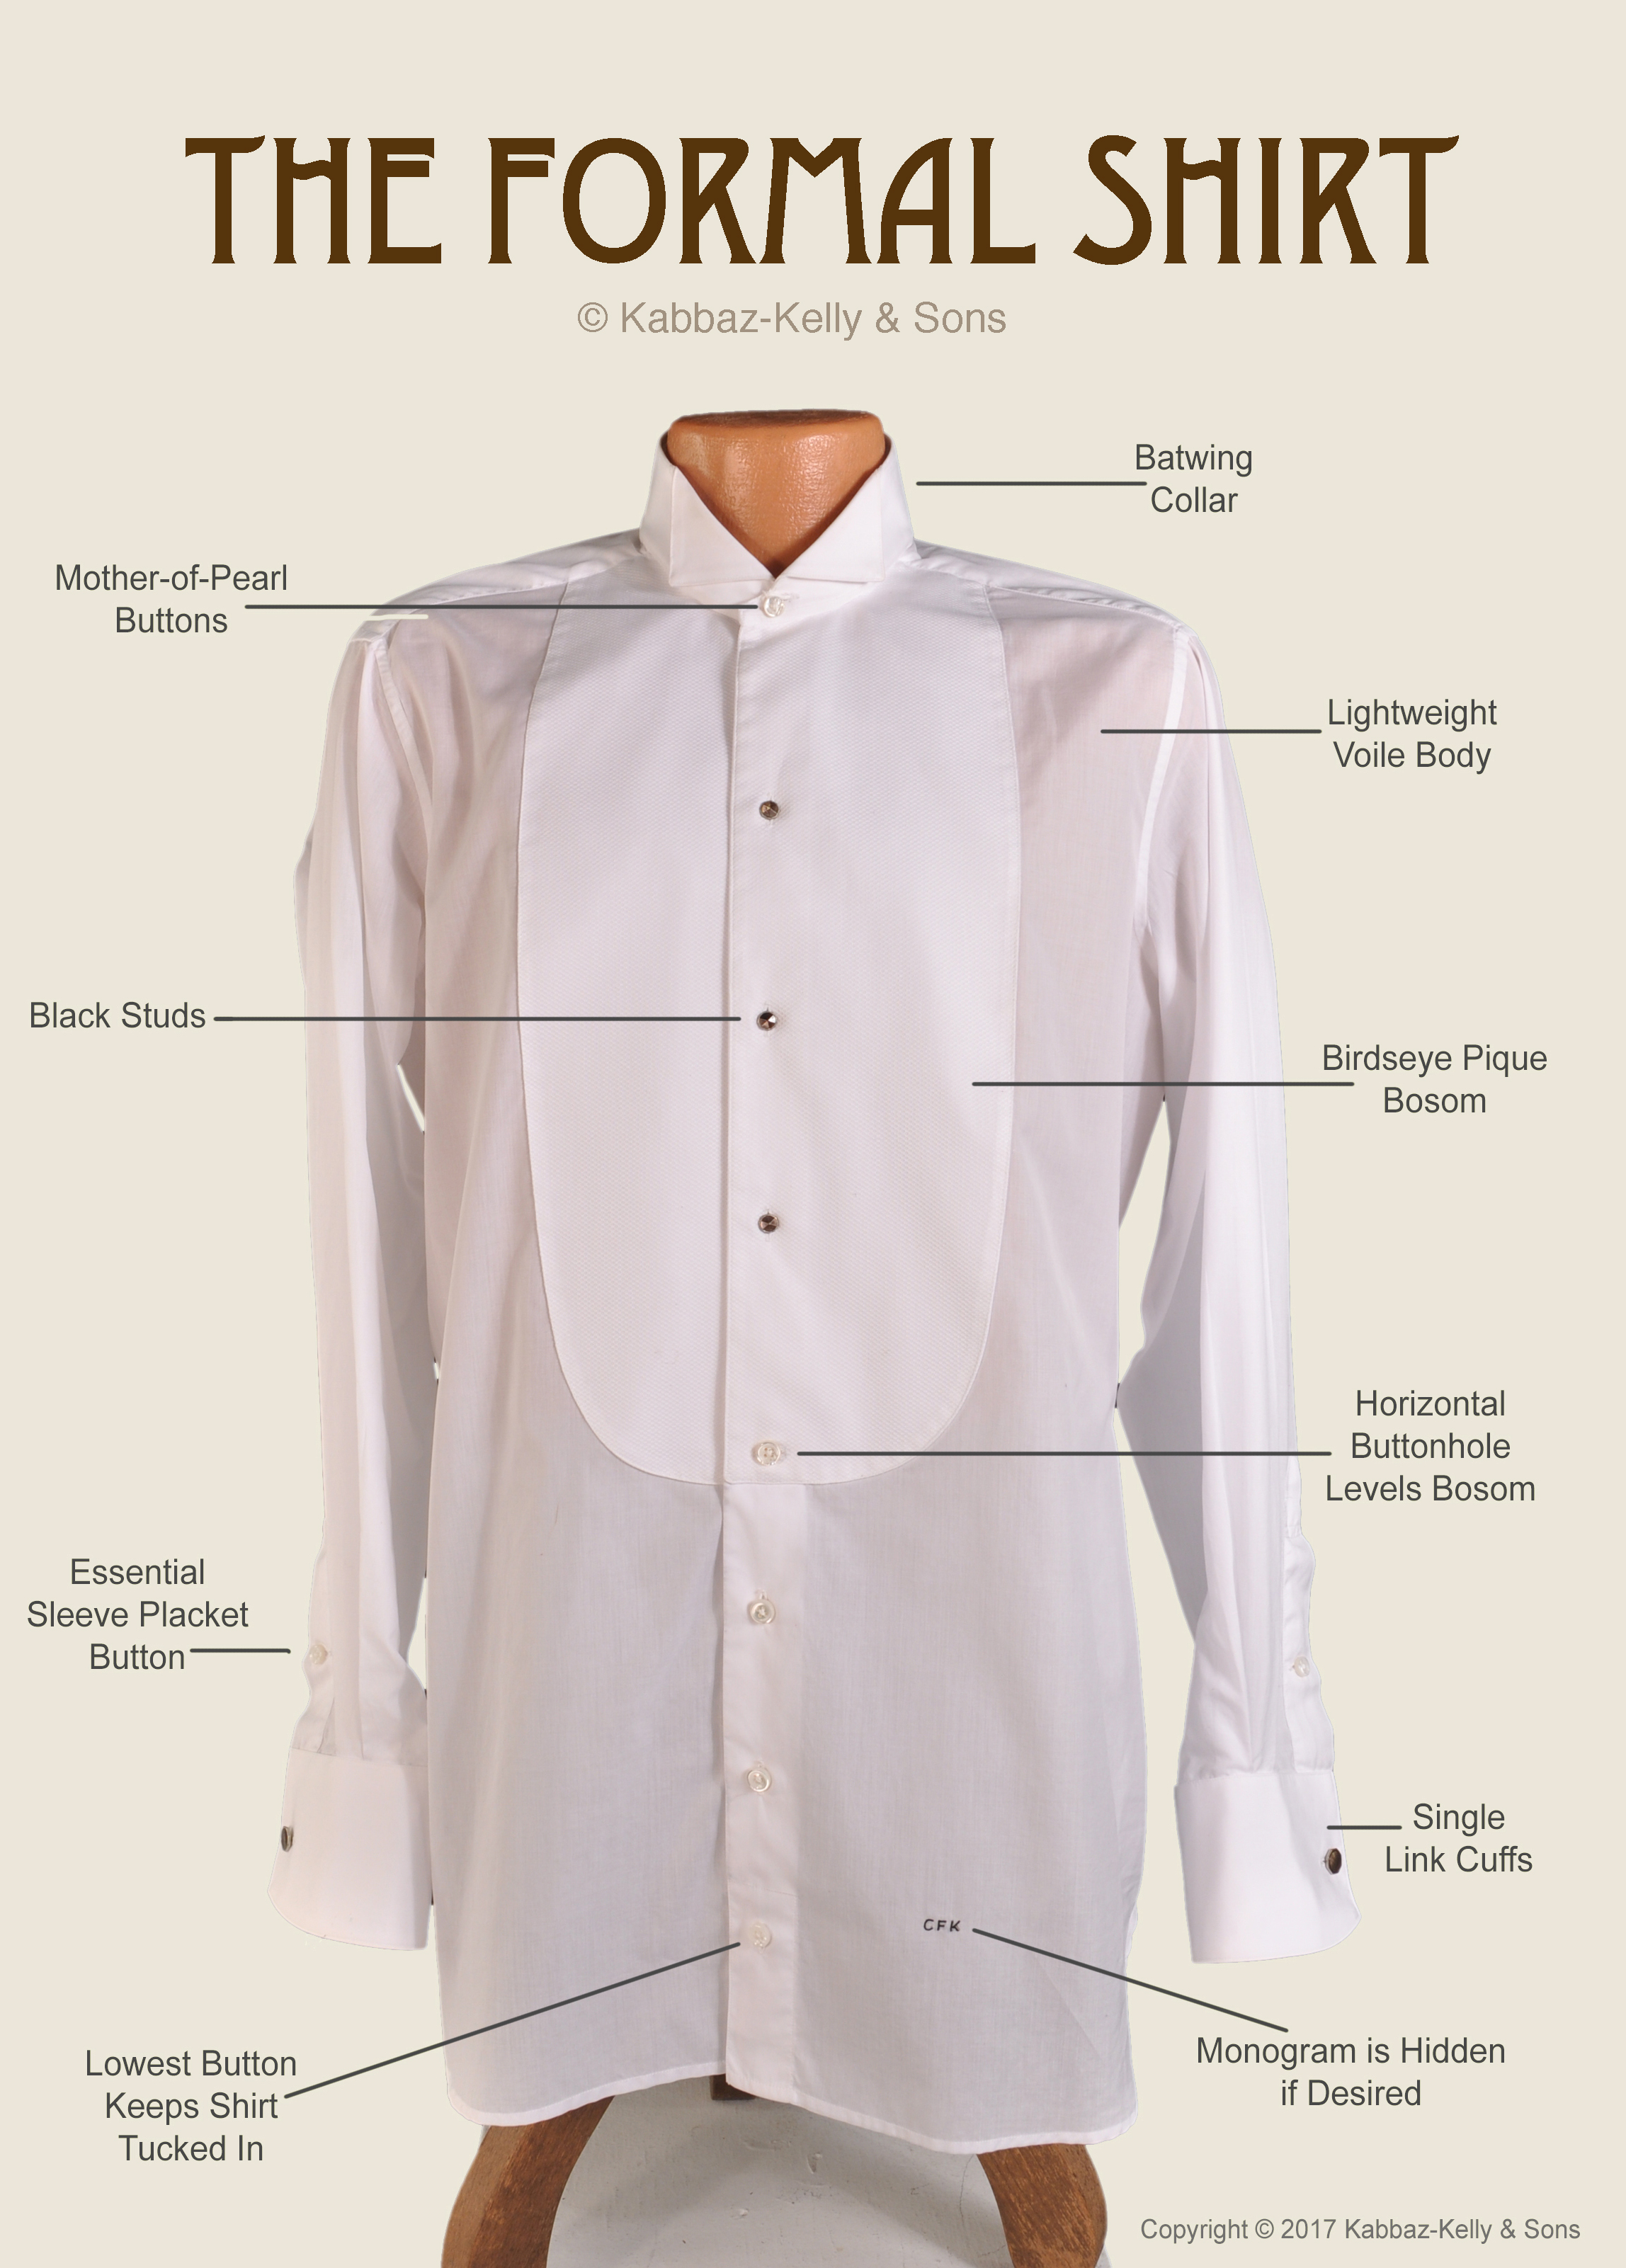 anatomy formal shirt characteristics construction